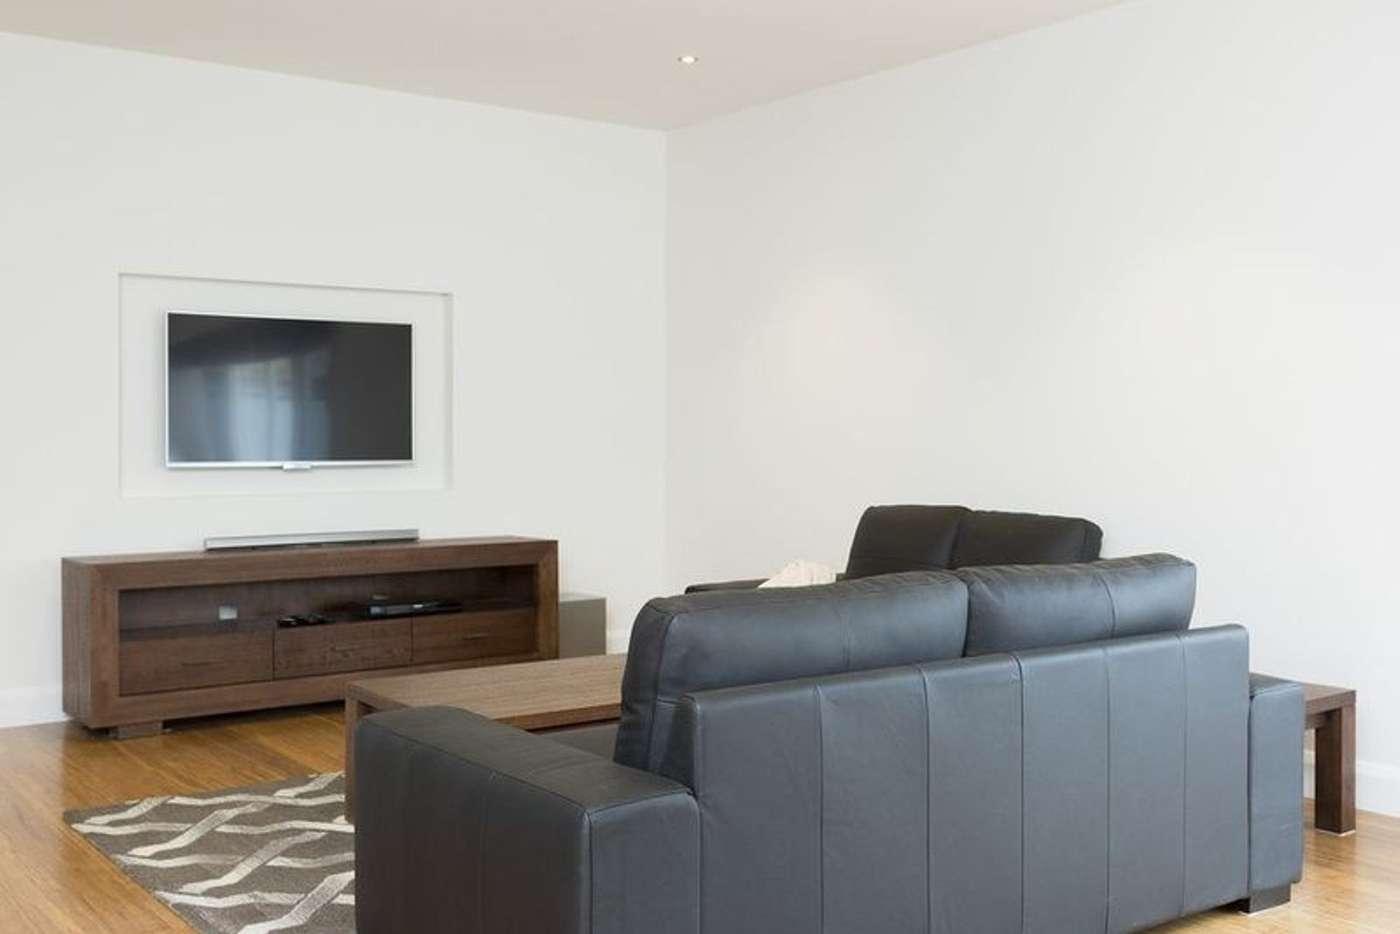 Seventh view of Homely house listing, 2 Holt Street, Bendigo VIC 3550